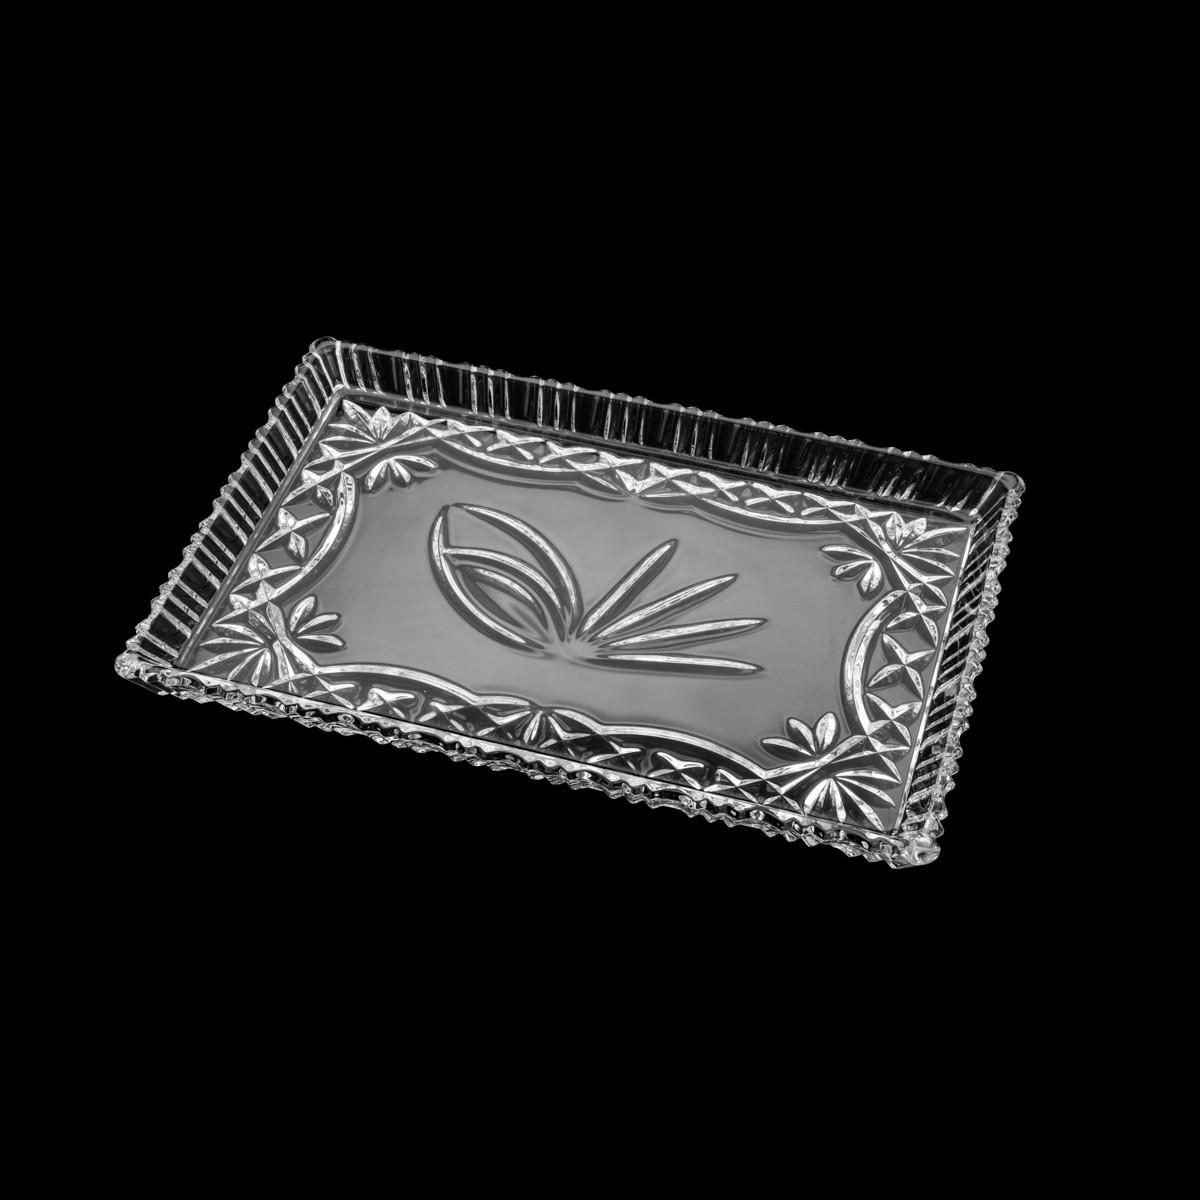 Travessa de Cristal de Chumbo Janine 29,5 x 19,5 cm